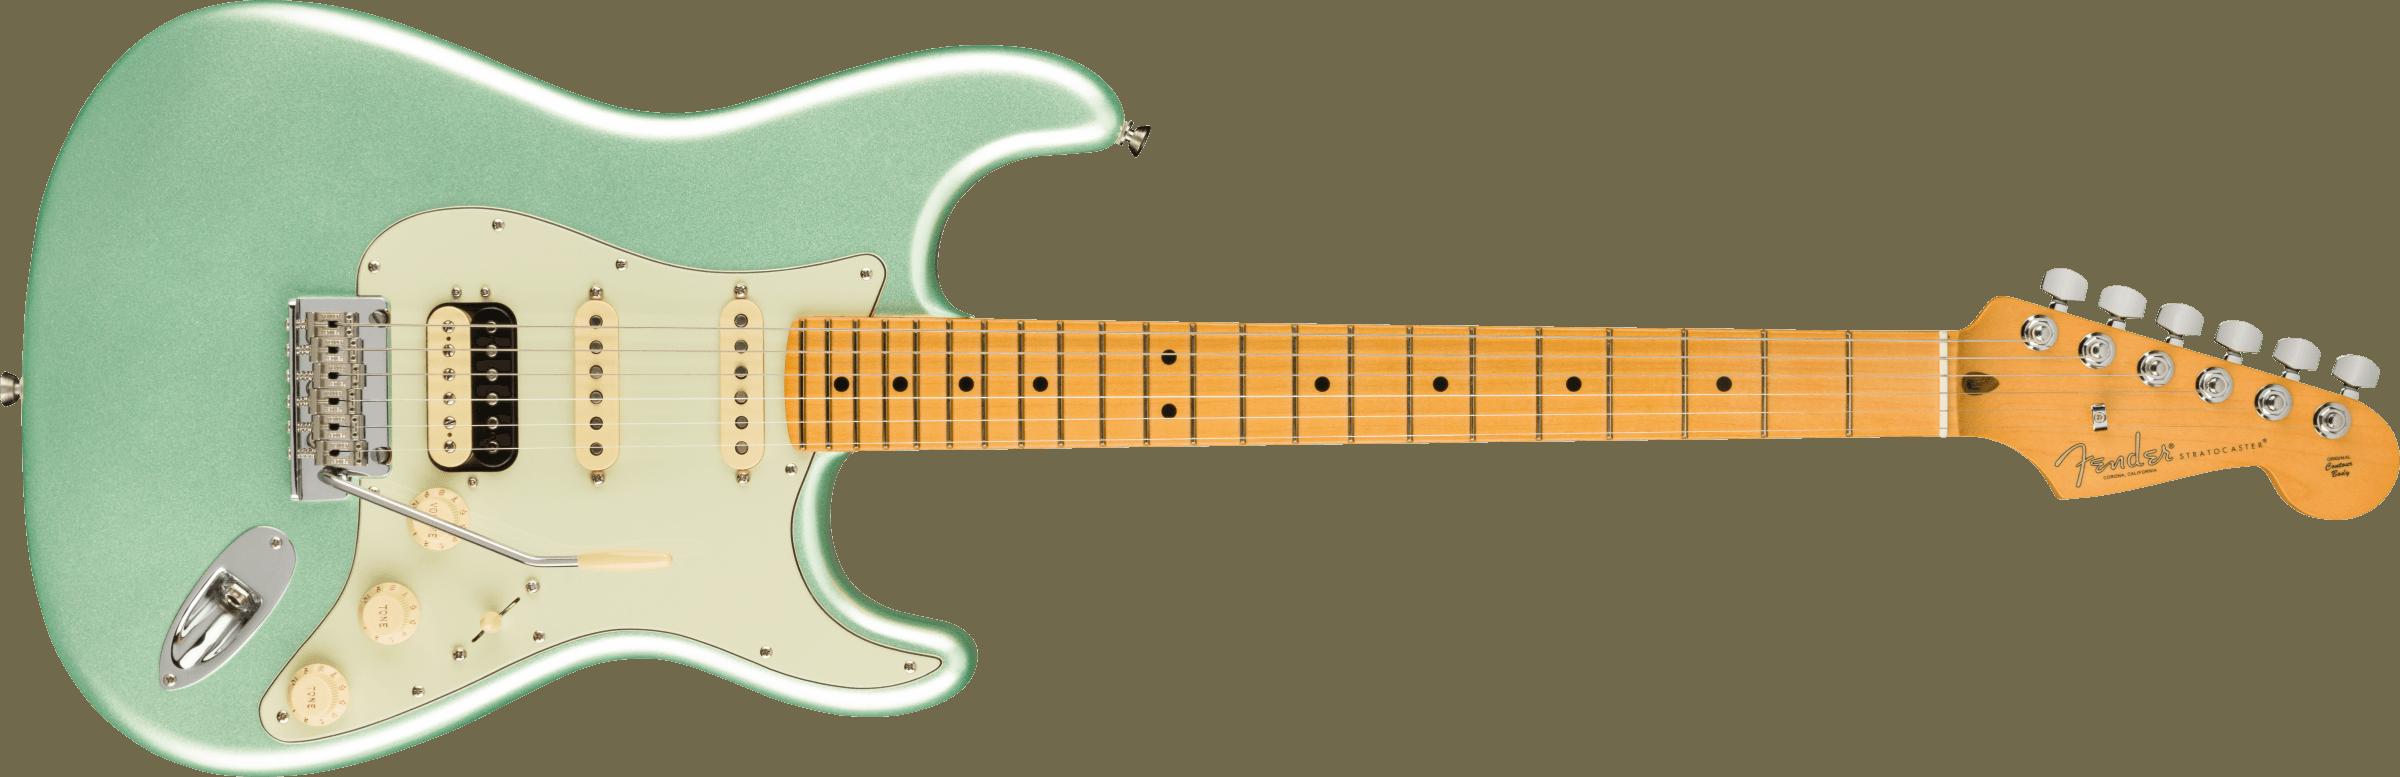 FENDER-American-Professional-II-Stratocaster-HSS-Maple-Fingerboard-Mystic-Surf-Green-sku-571005534